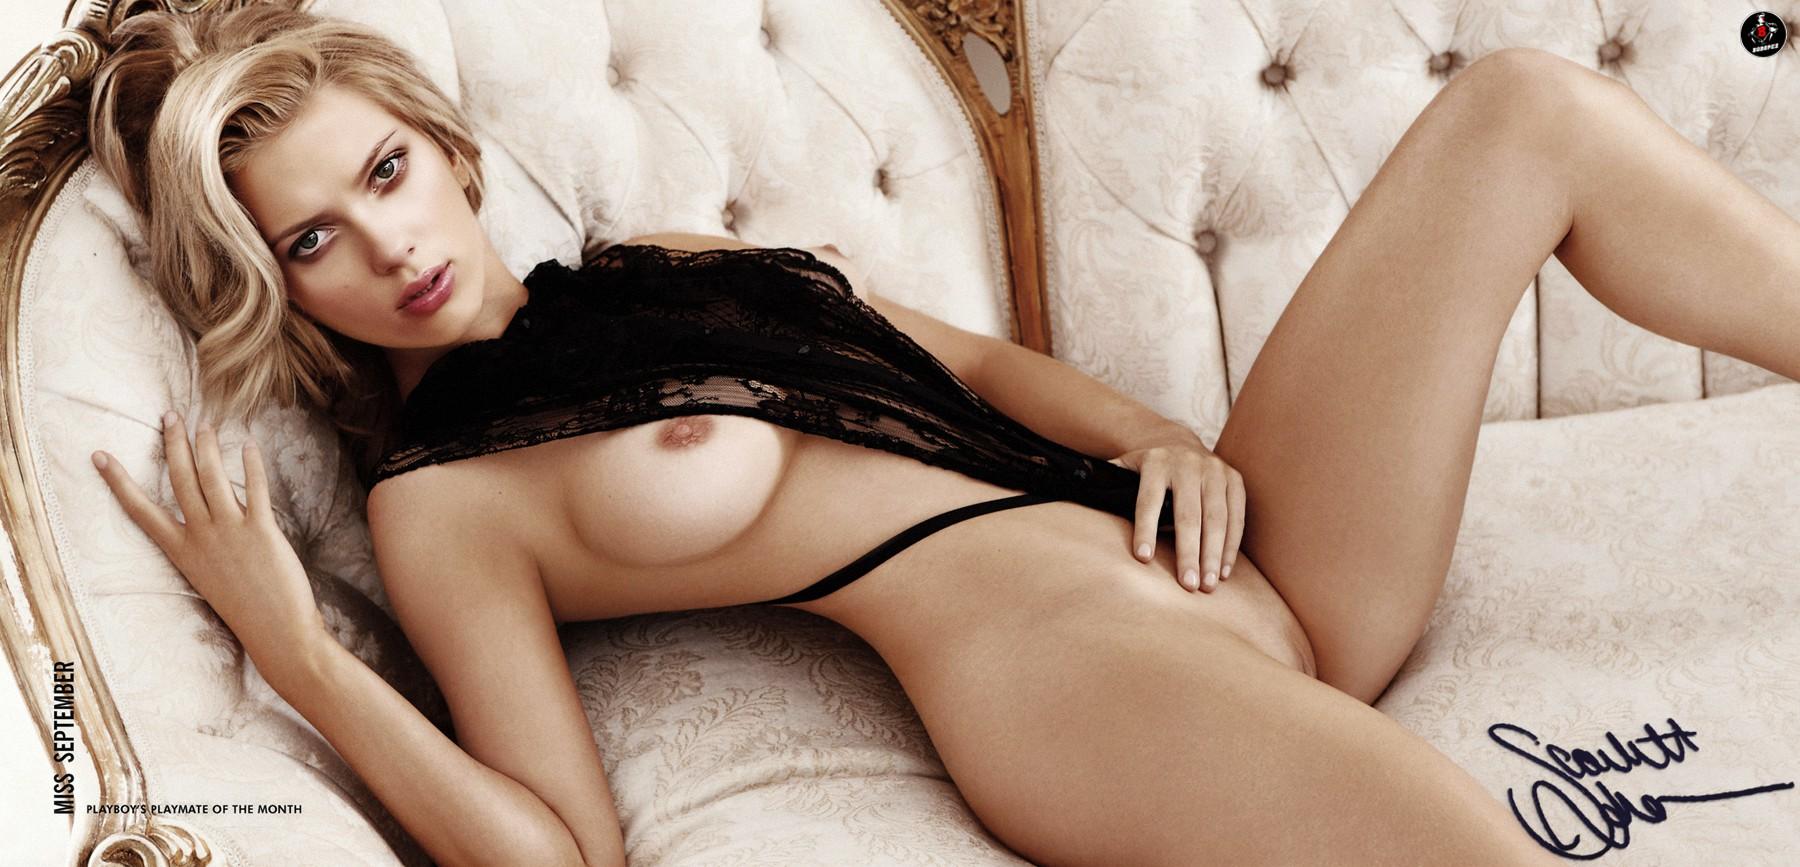 Scarlett johansson hottest pussy photos — img 13